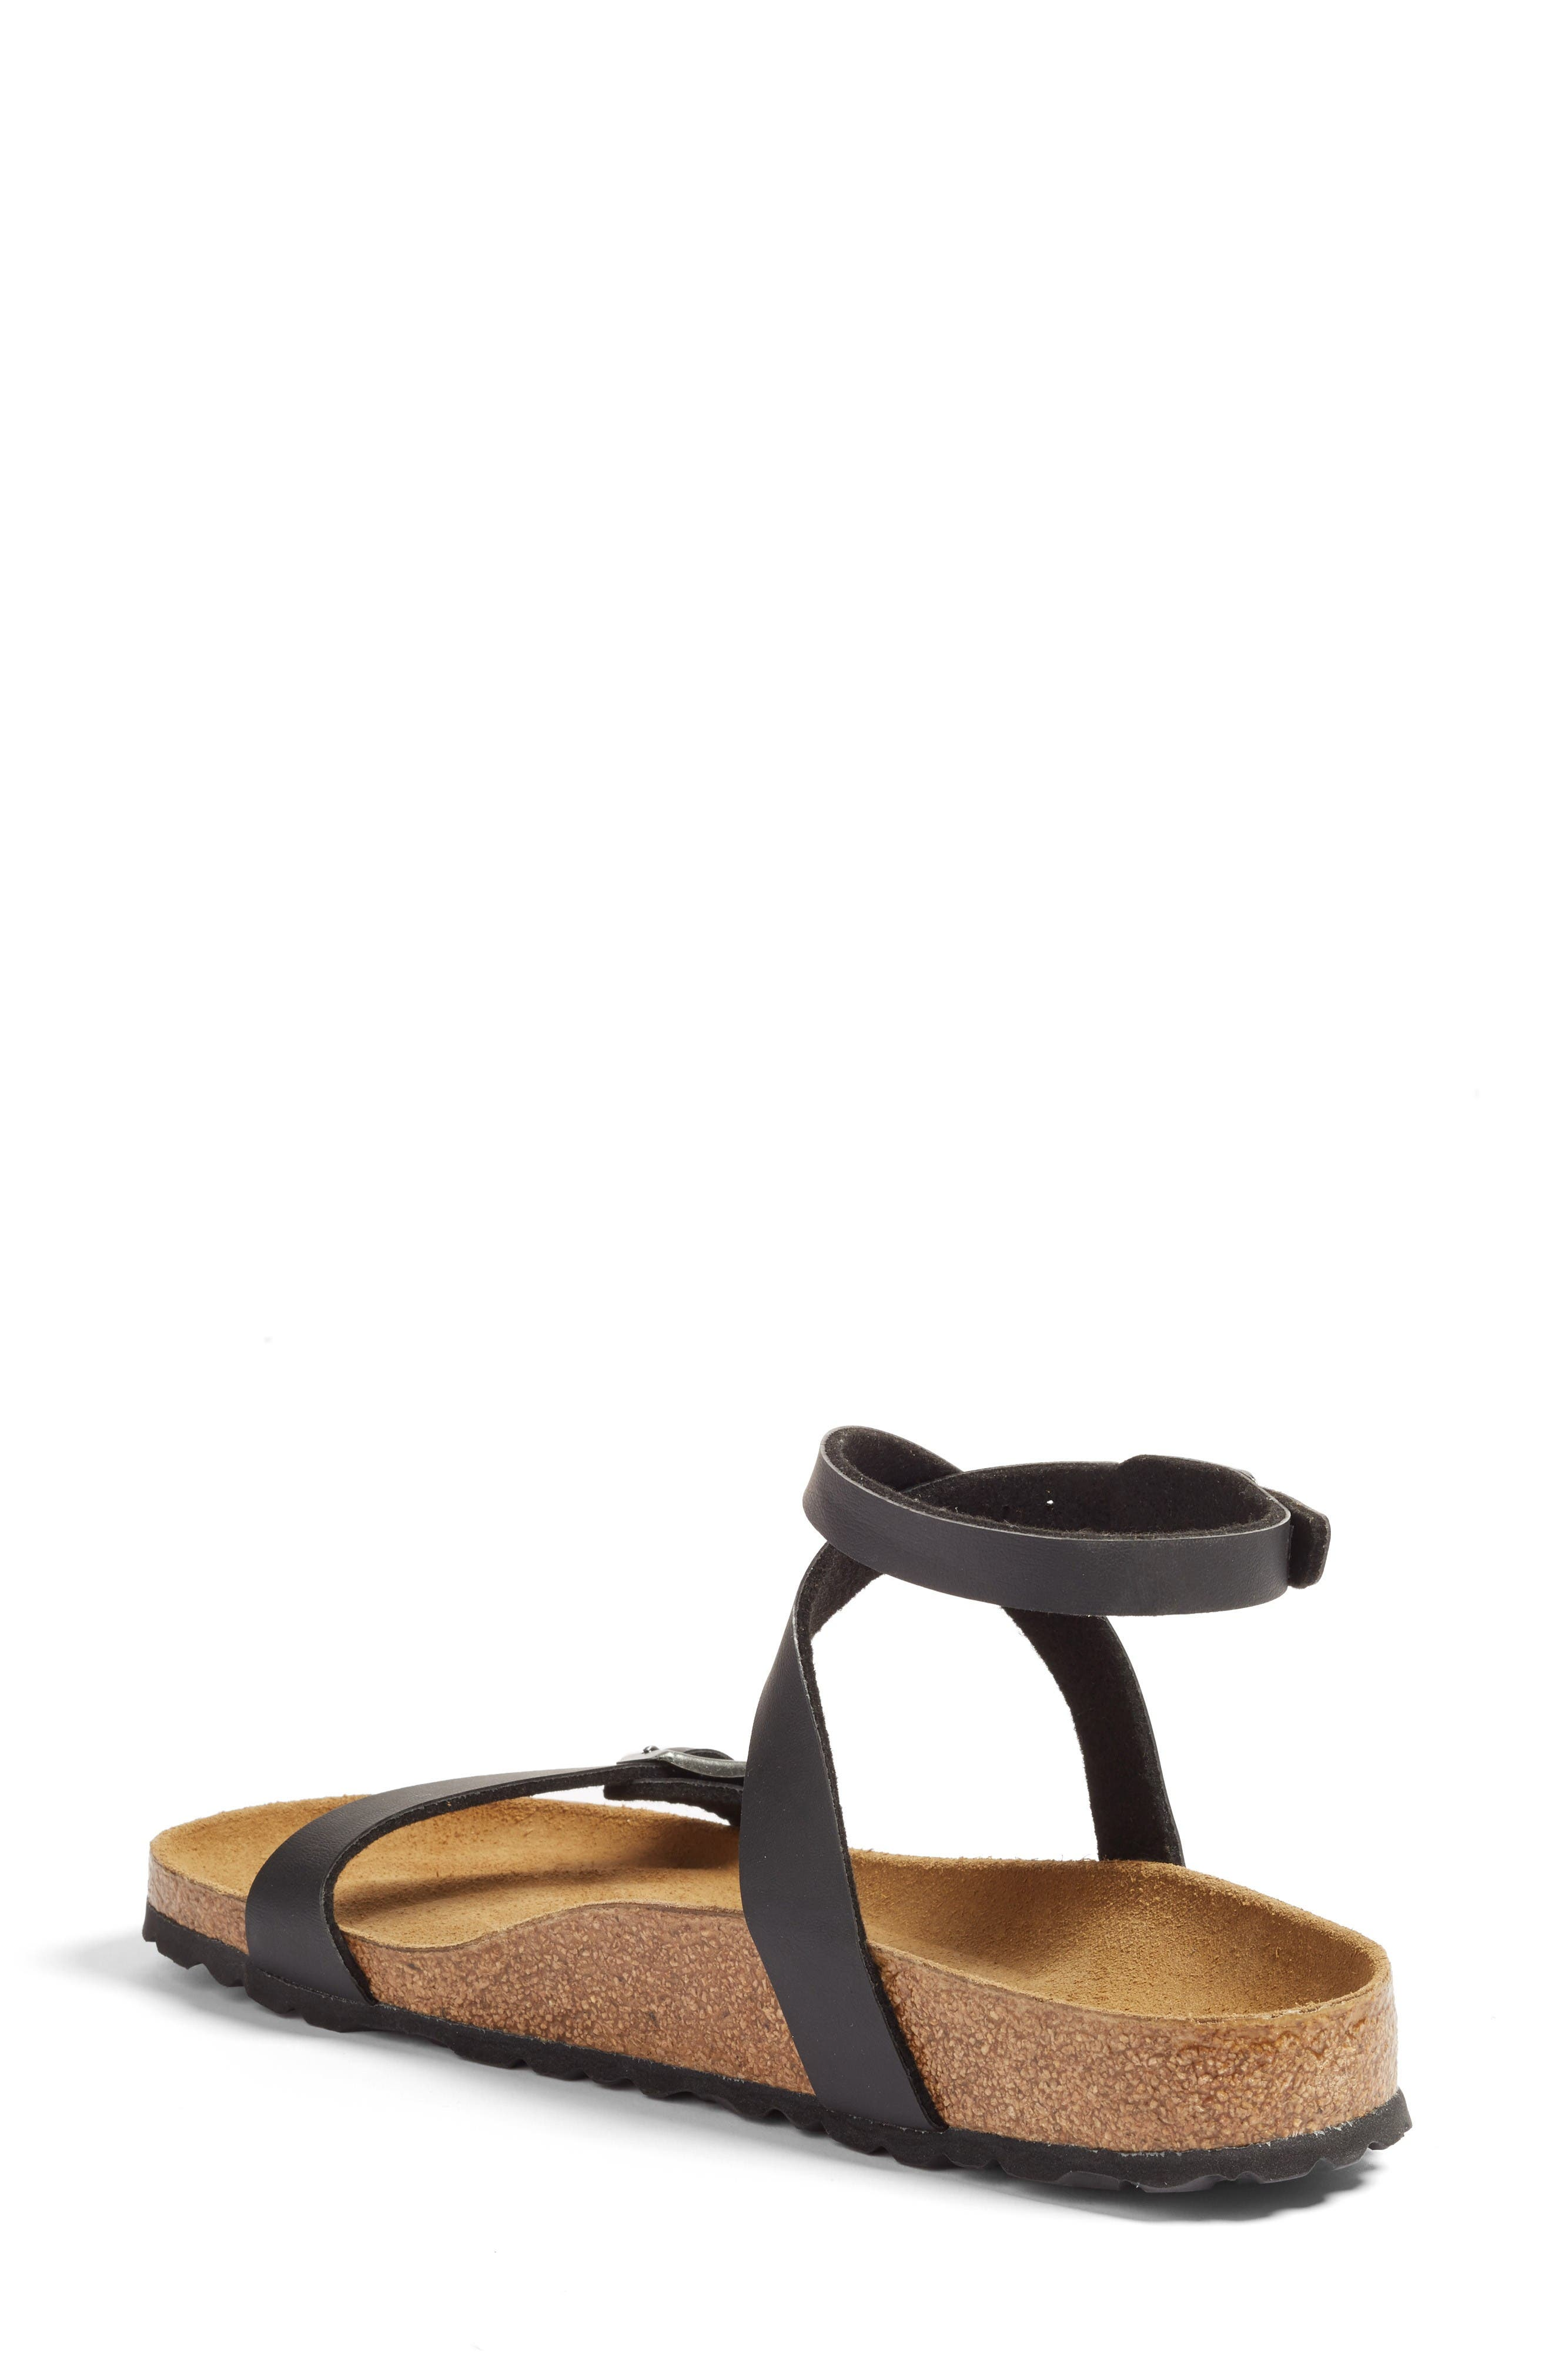 Daloa Ankle Strap Sandal,                             Alternate thumbnail 2, color,                             Black